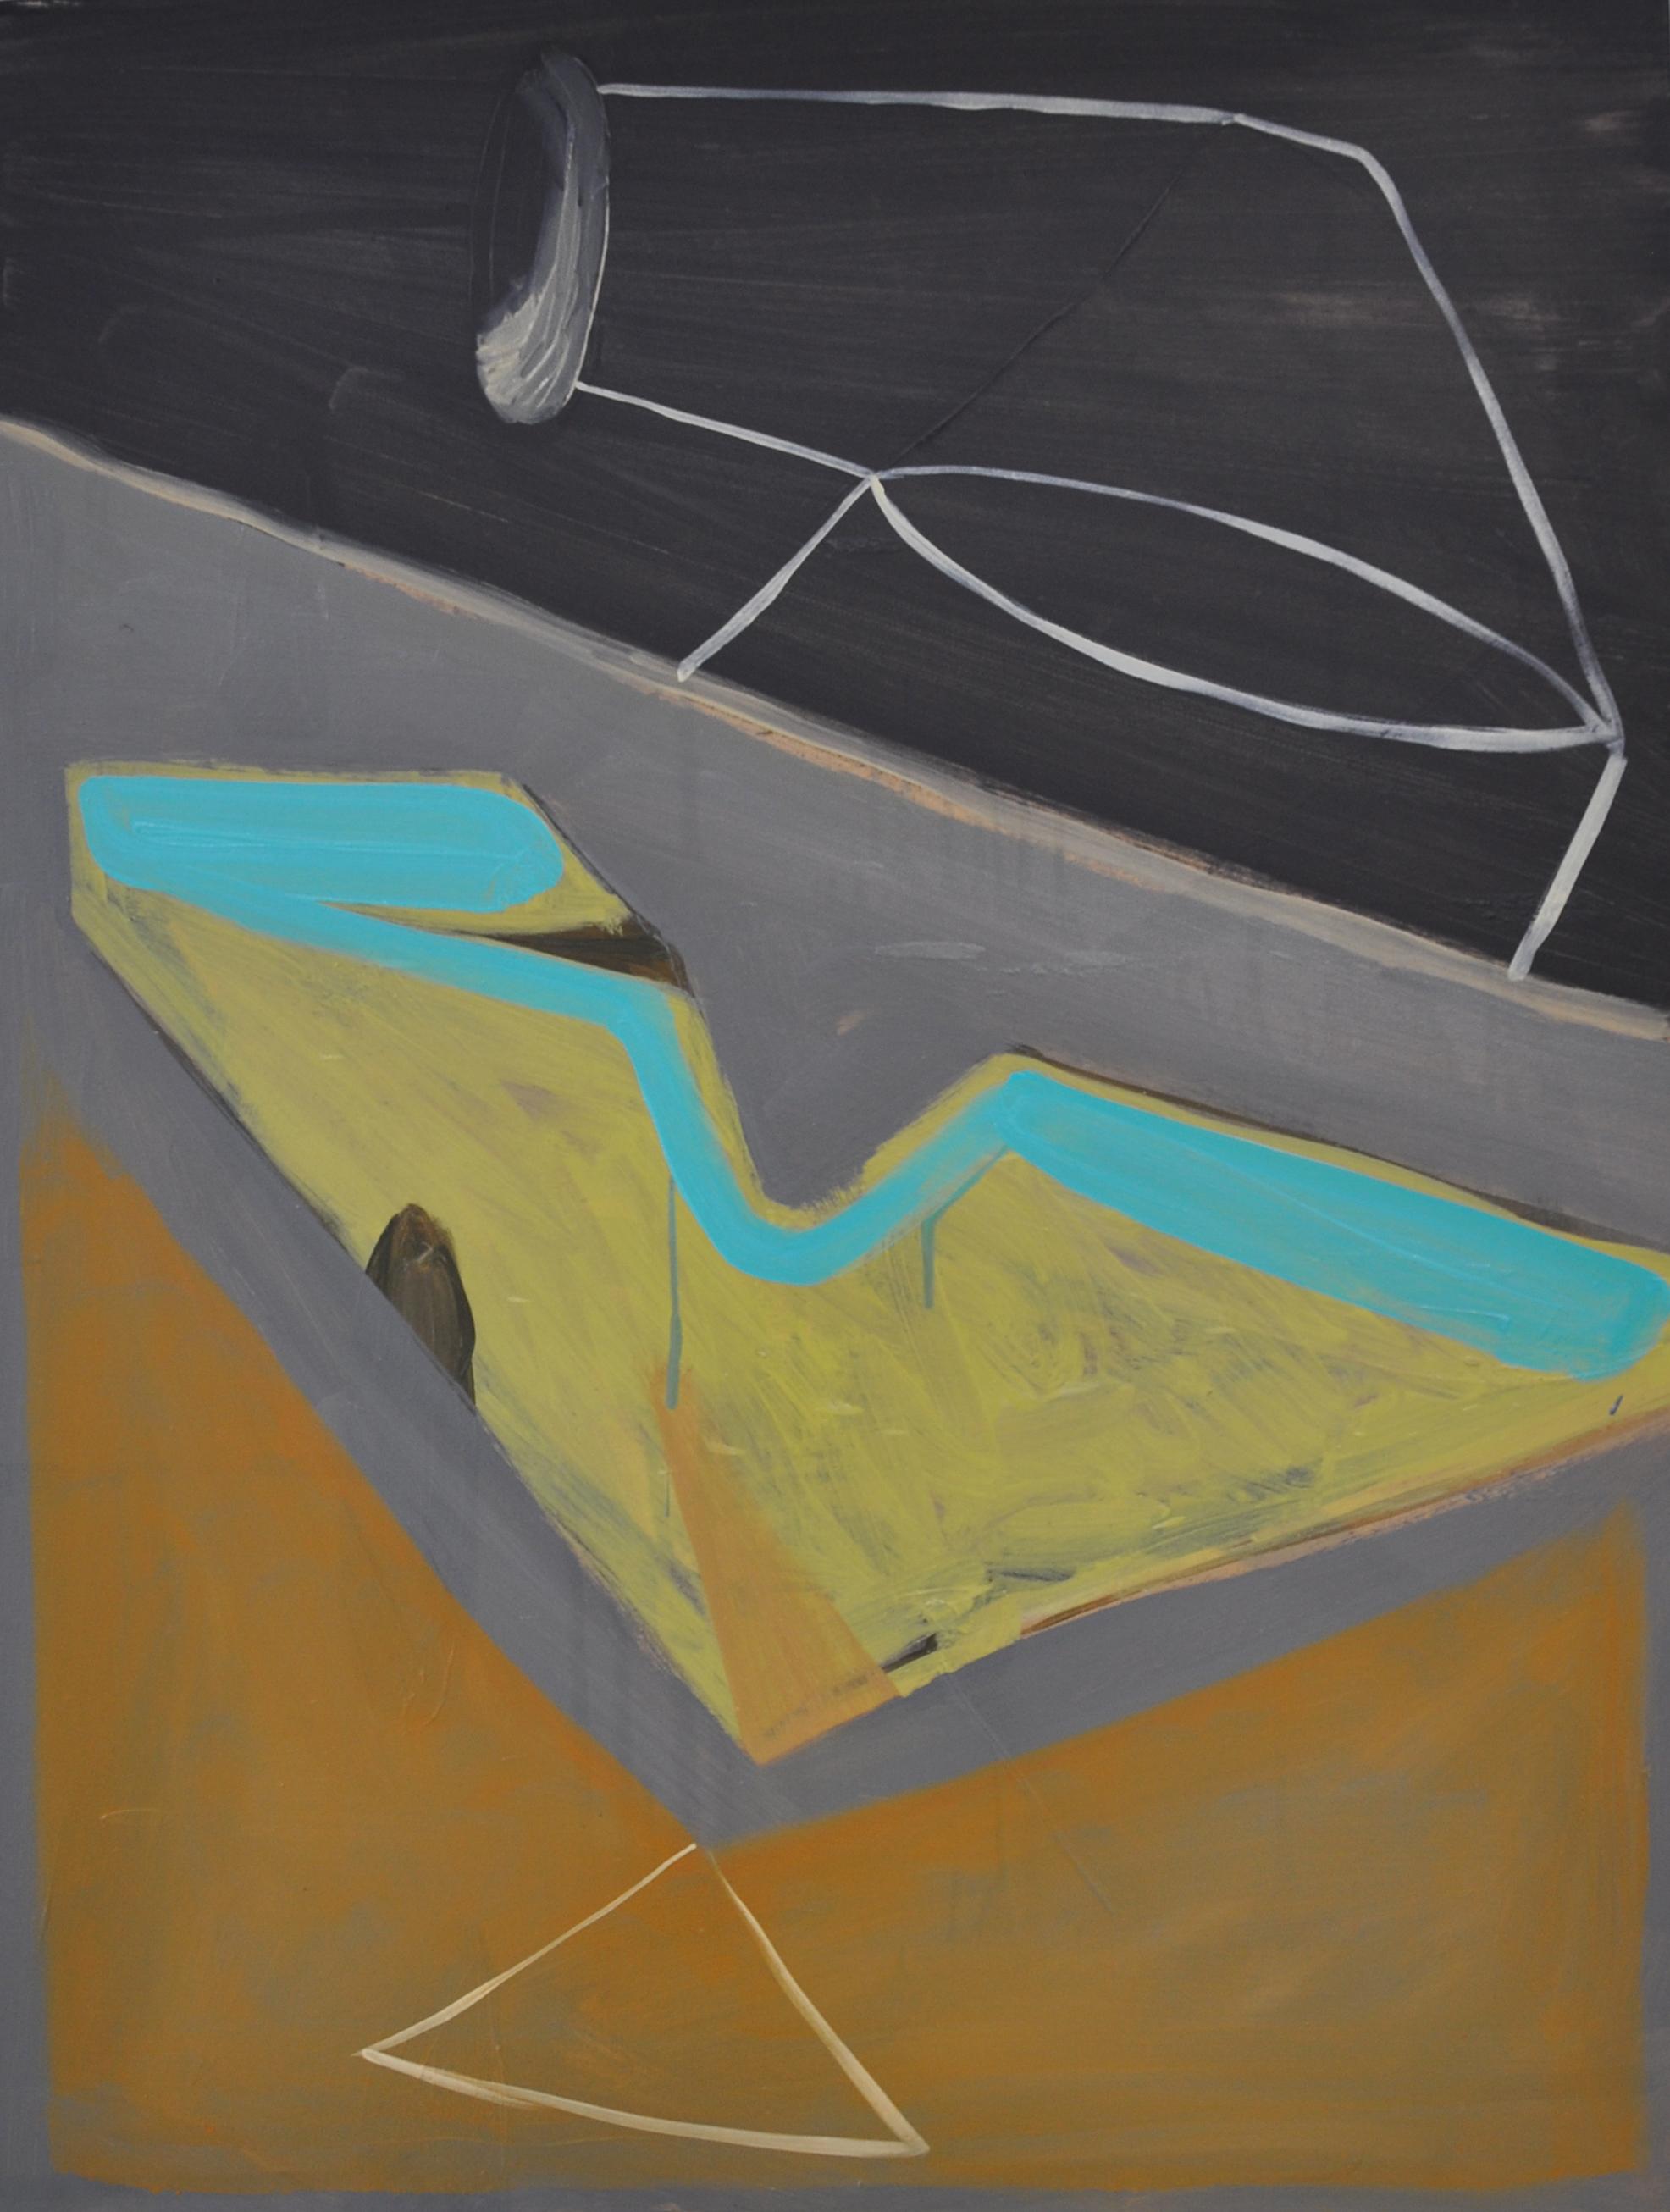 Body, 2011, Oil on cotton, 80 x 60 cm